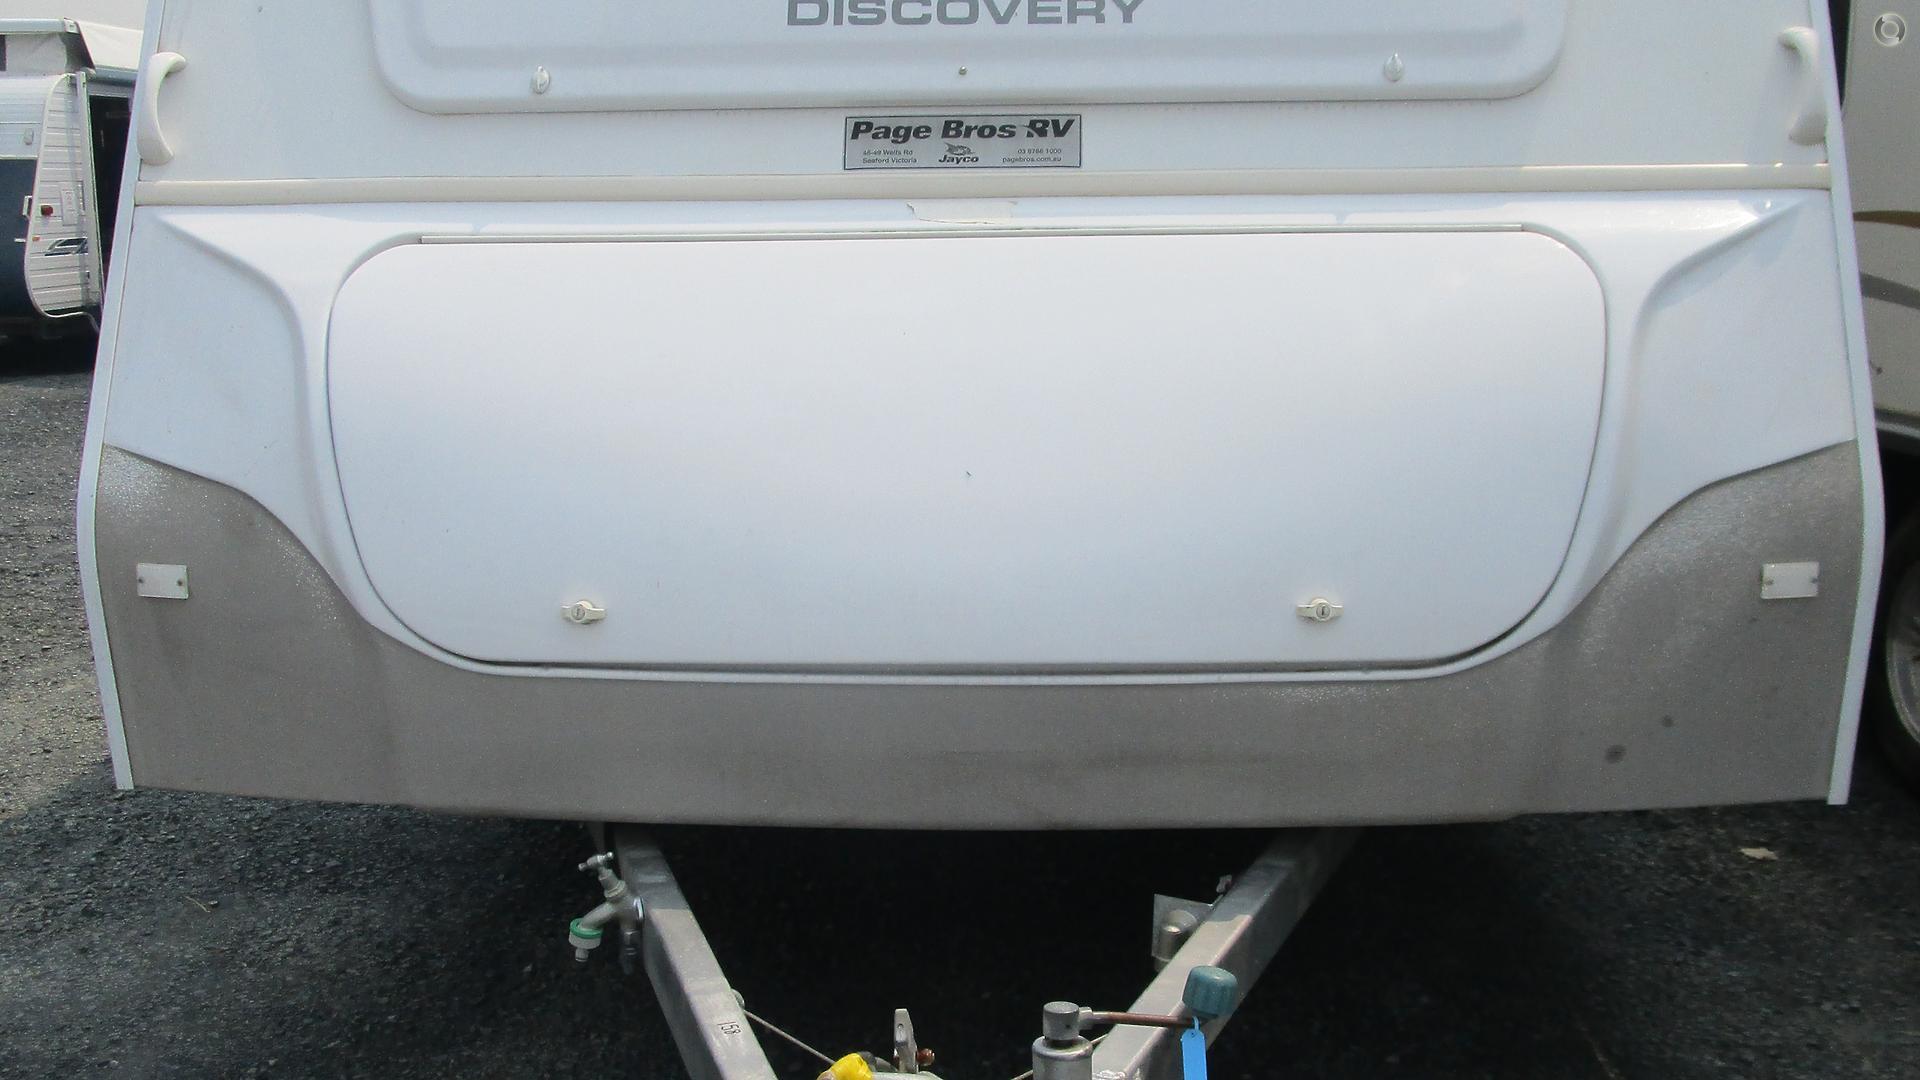 2012 Jayco Discovery